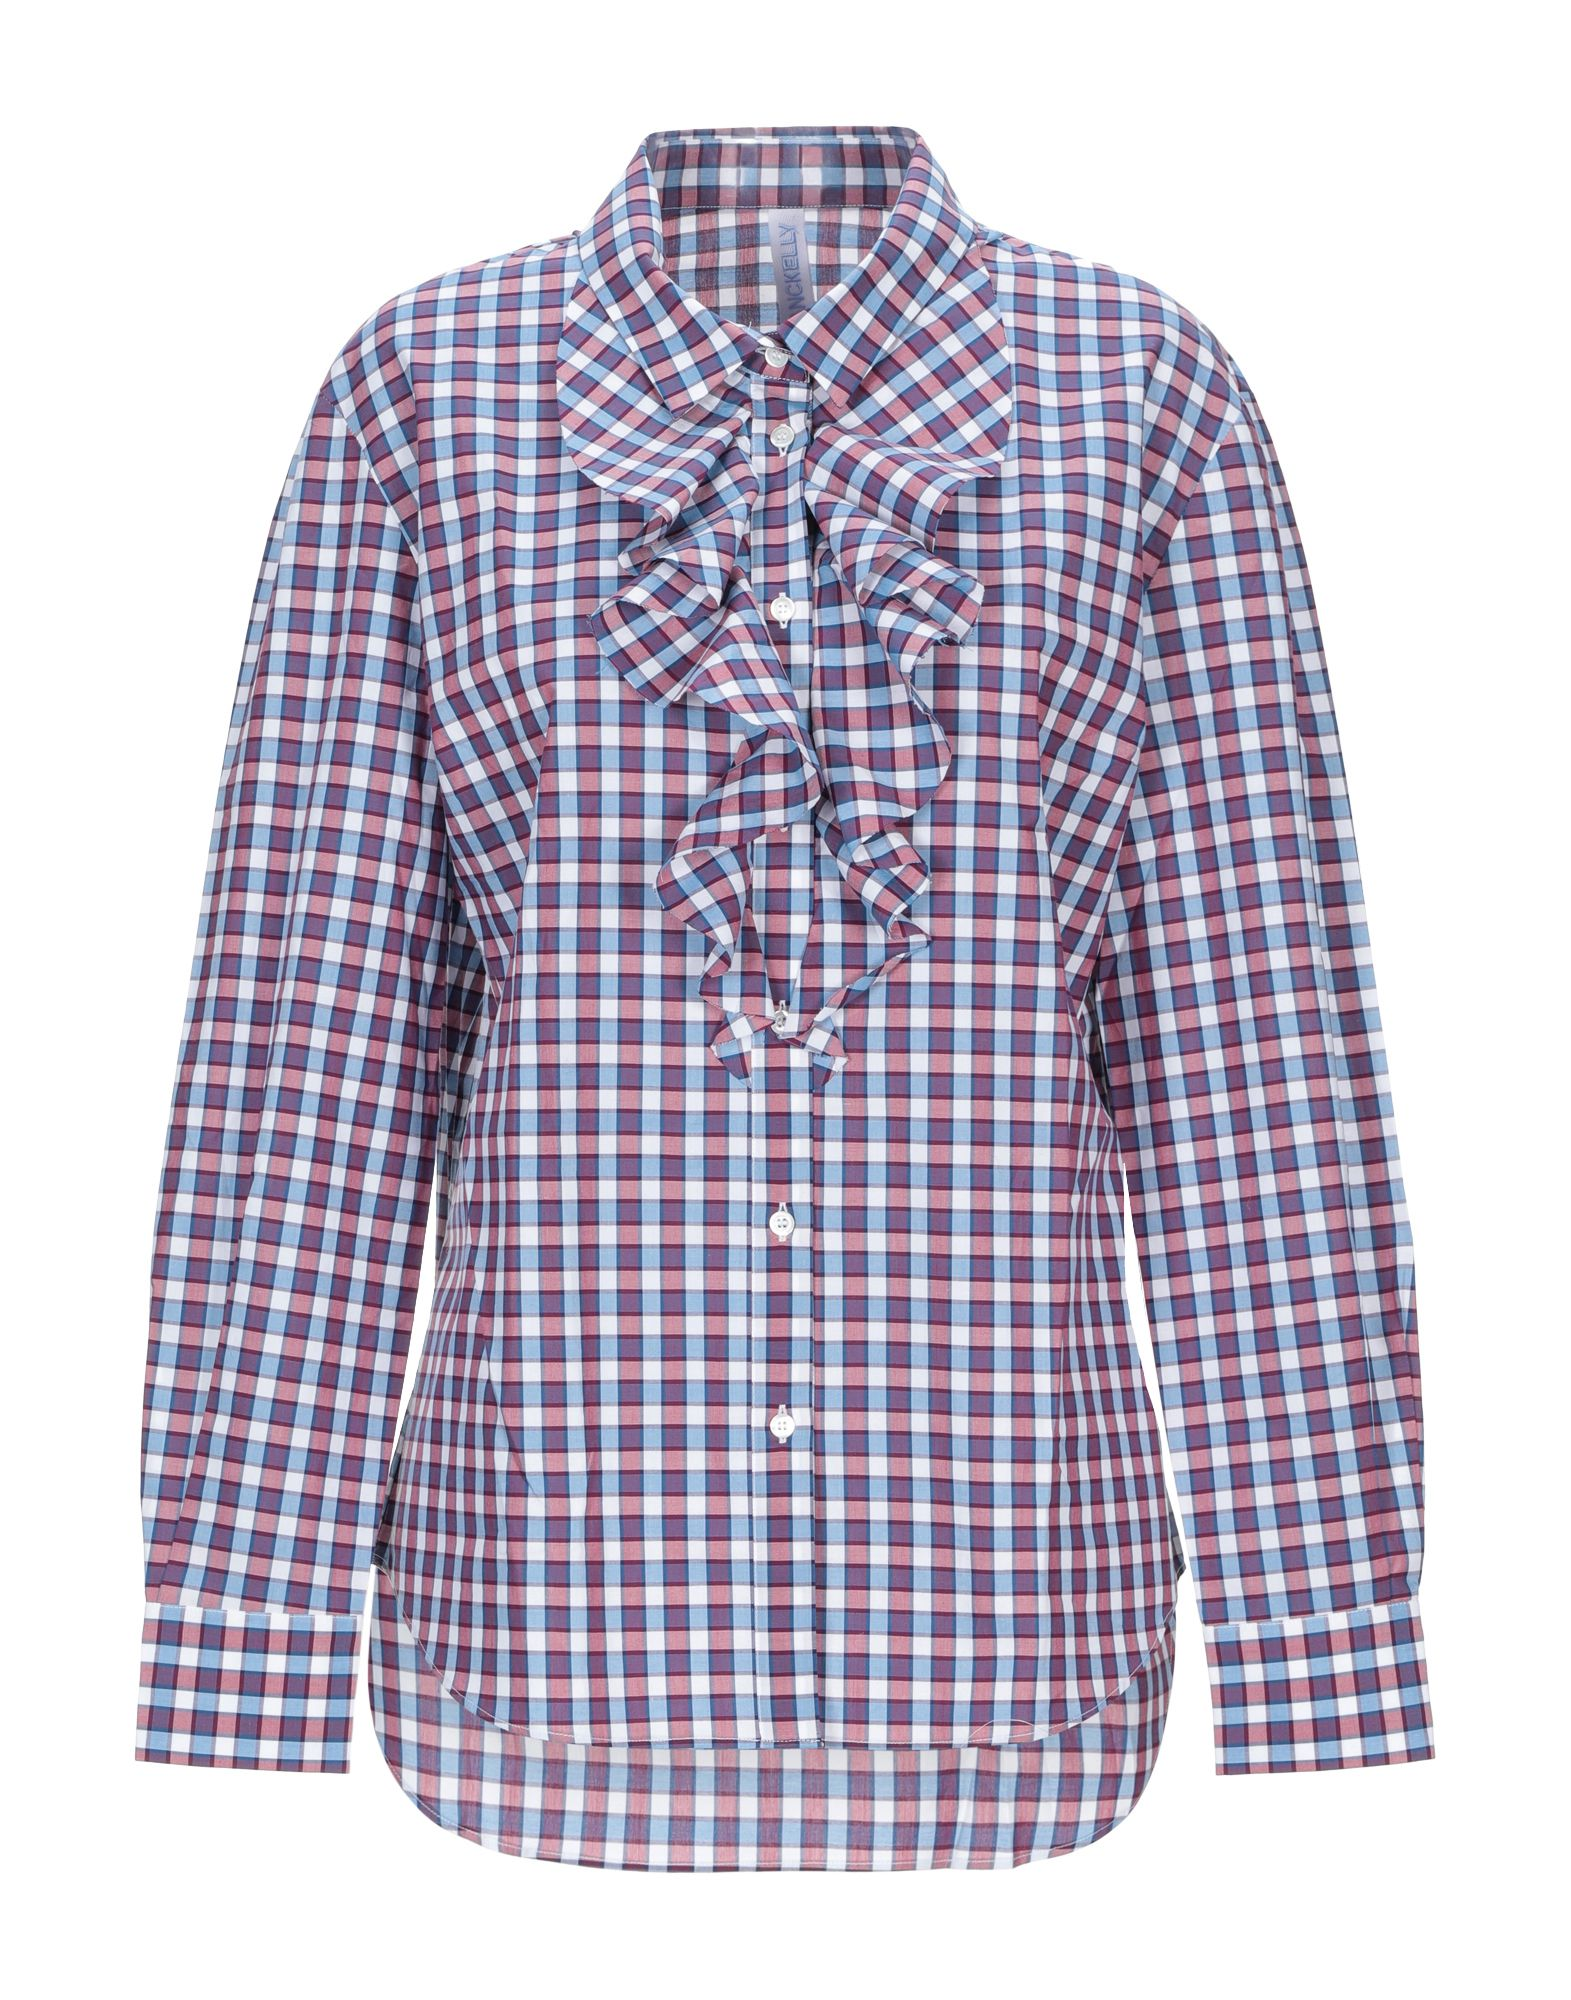 цены на BLANCKELLY Pубашка  в интернет-магазинах